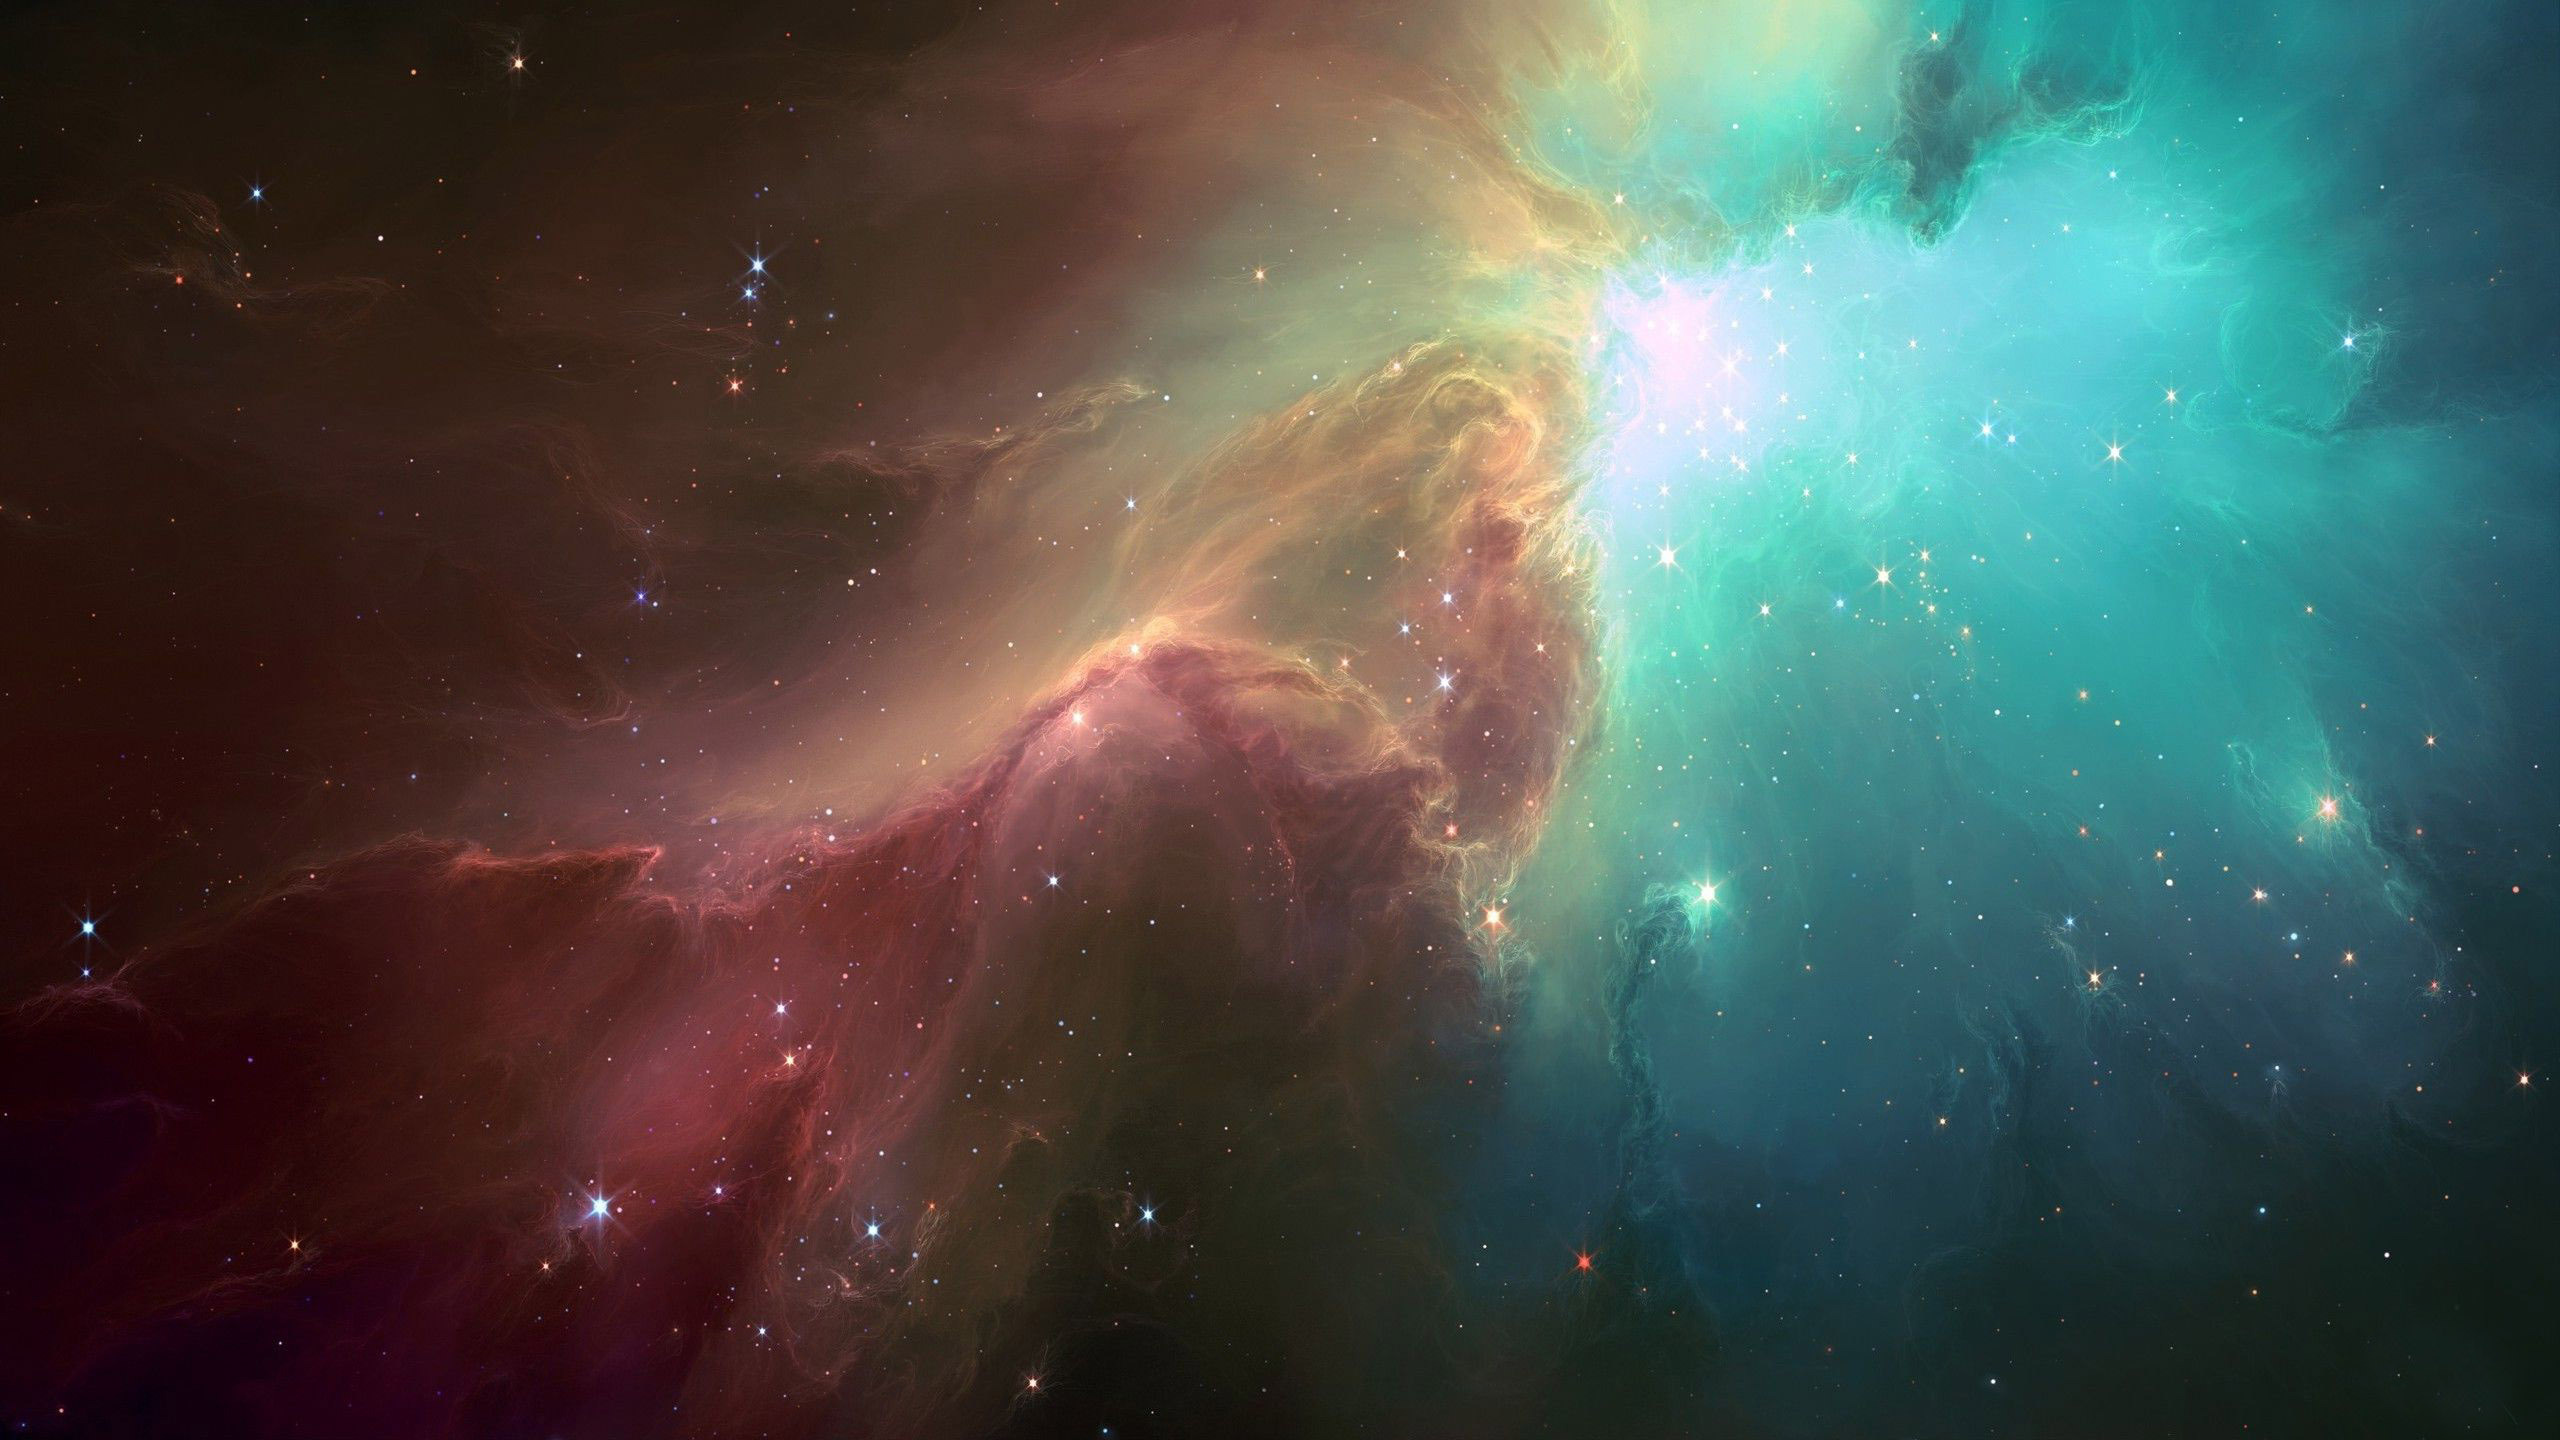 Multicolored Nebula wallpapers HD   476741 2560x1440